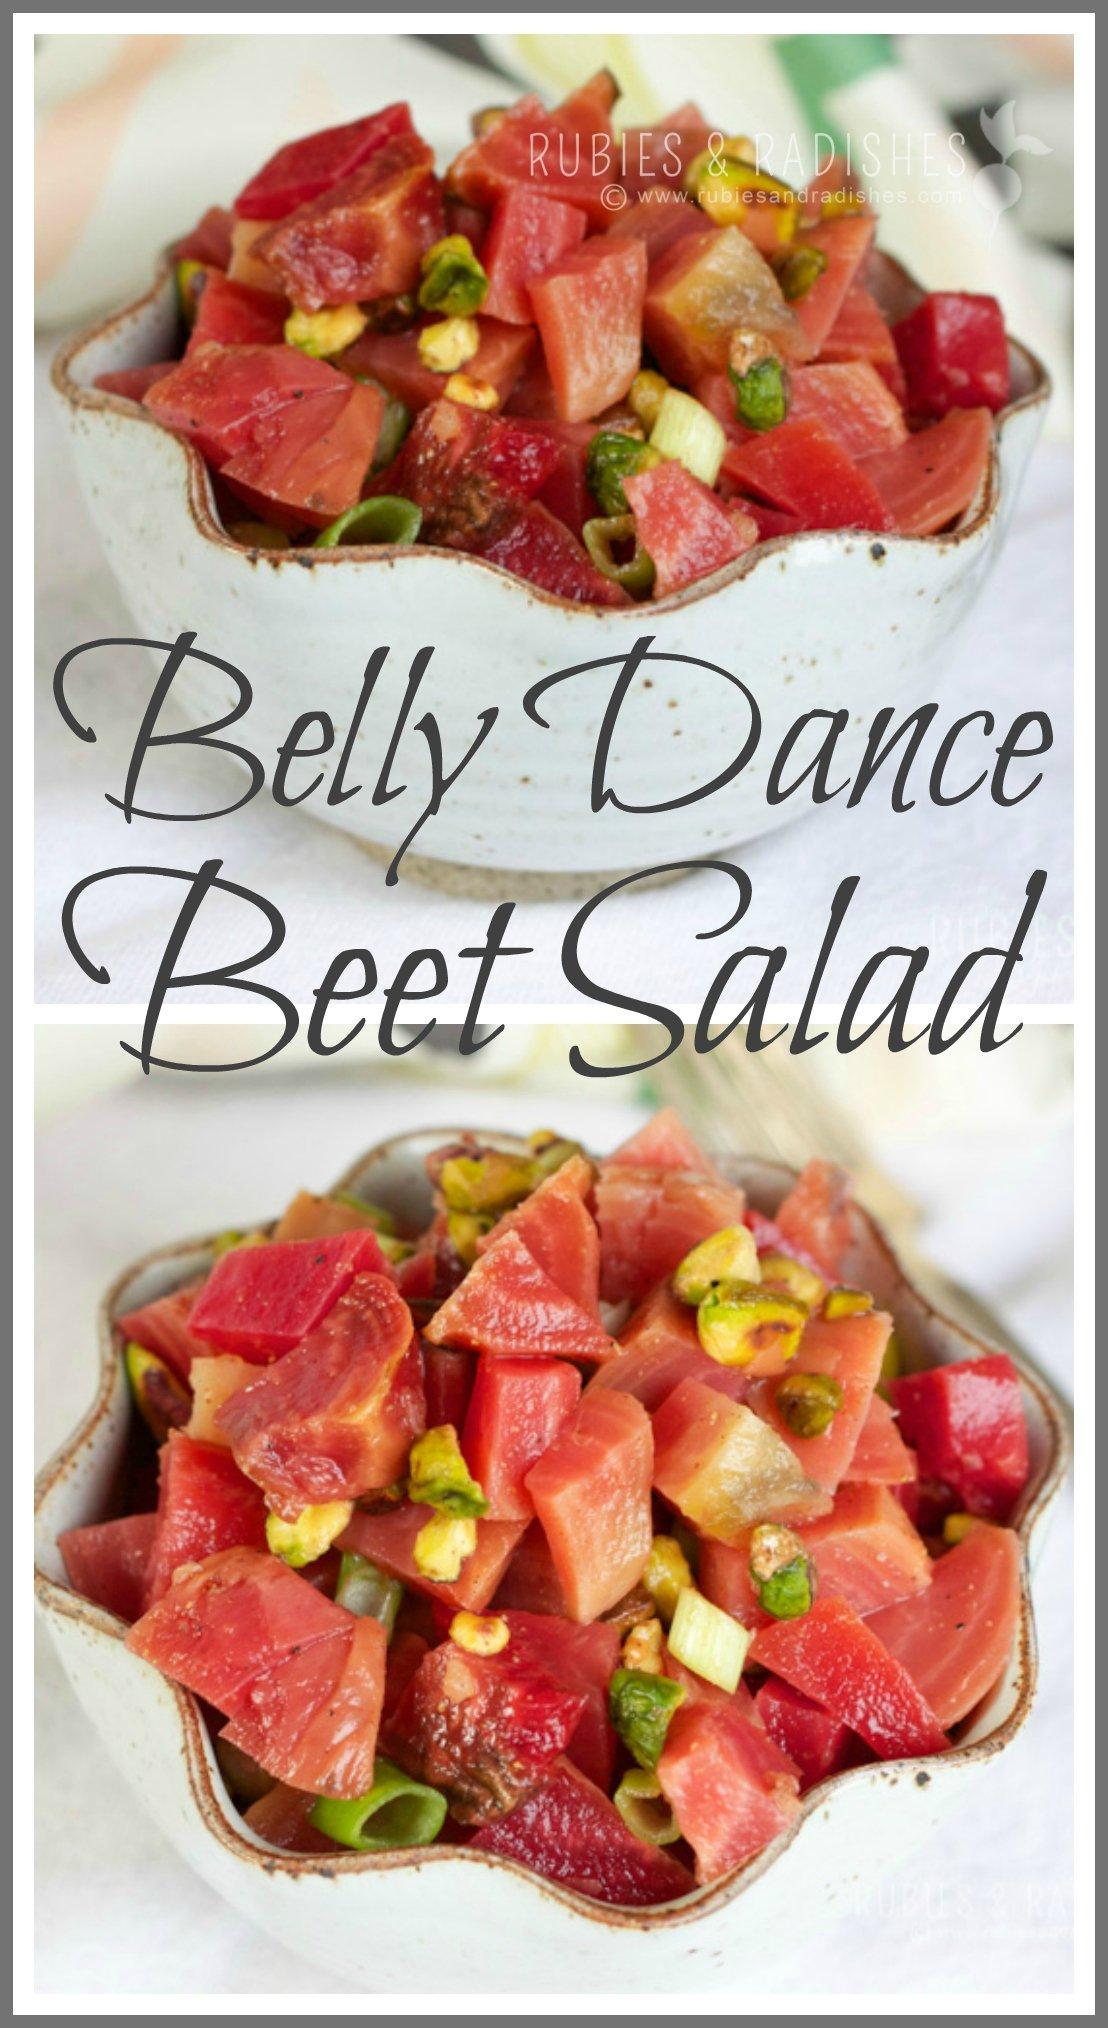 Belly Dance Beet Salad